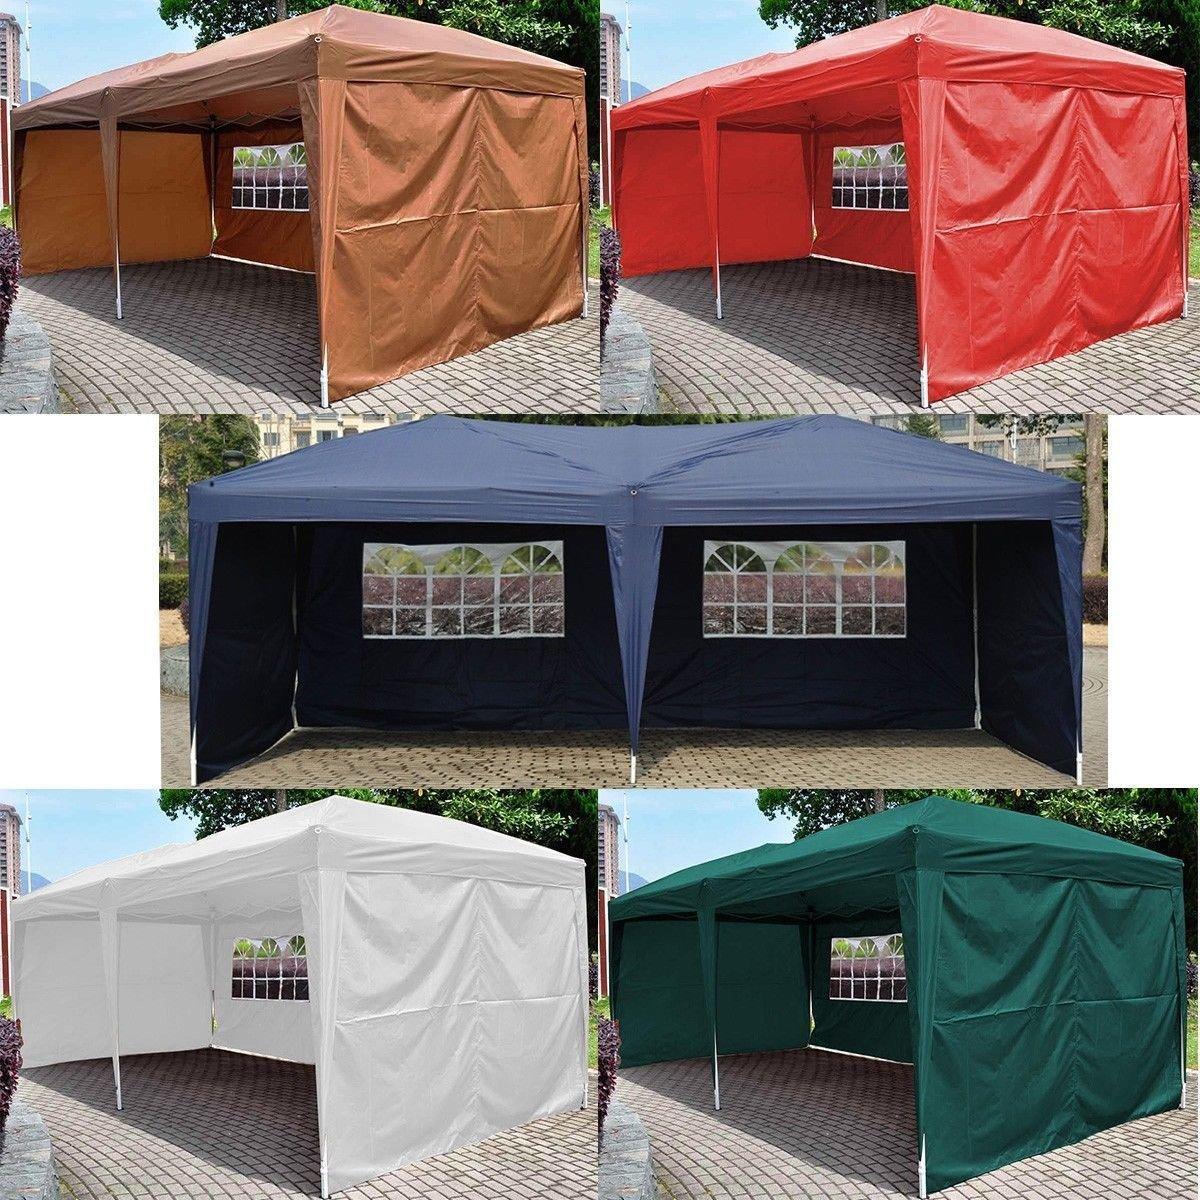 Generic YCUS150720-184 <8&11781> randomTent Foldin Folding Gazebo Beach 10¡¯X20¡¯ EZ POP UP Canopy W/Carry Bag Wedding Party Tent color random 10¡¯X20¡¯ EZ